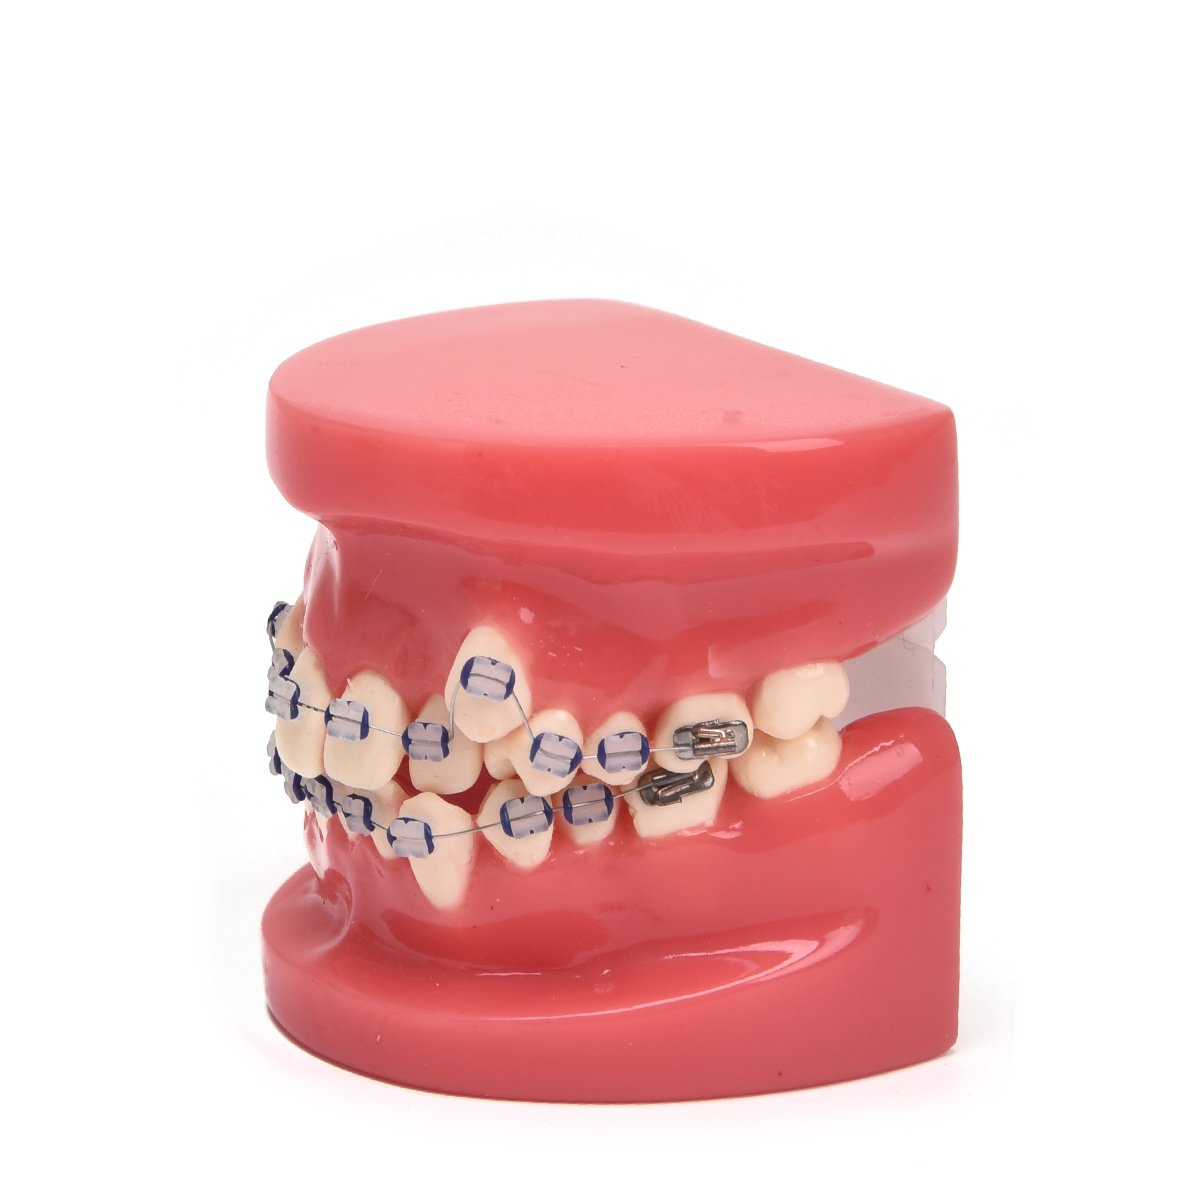 Annhua Demonstration Orthodontic Model Teeth Teach Study Tools with Coloured Ceramic Bracket